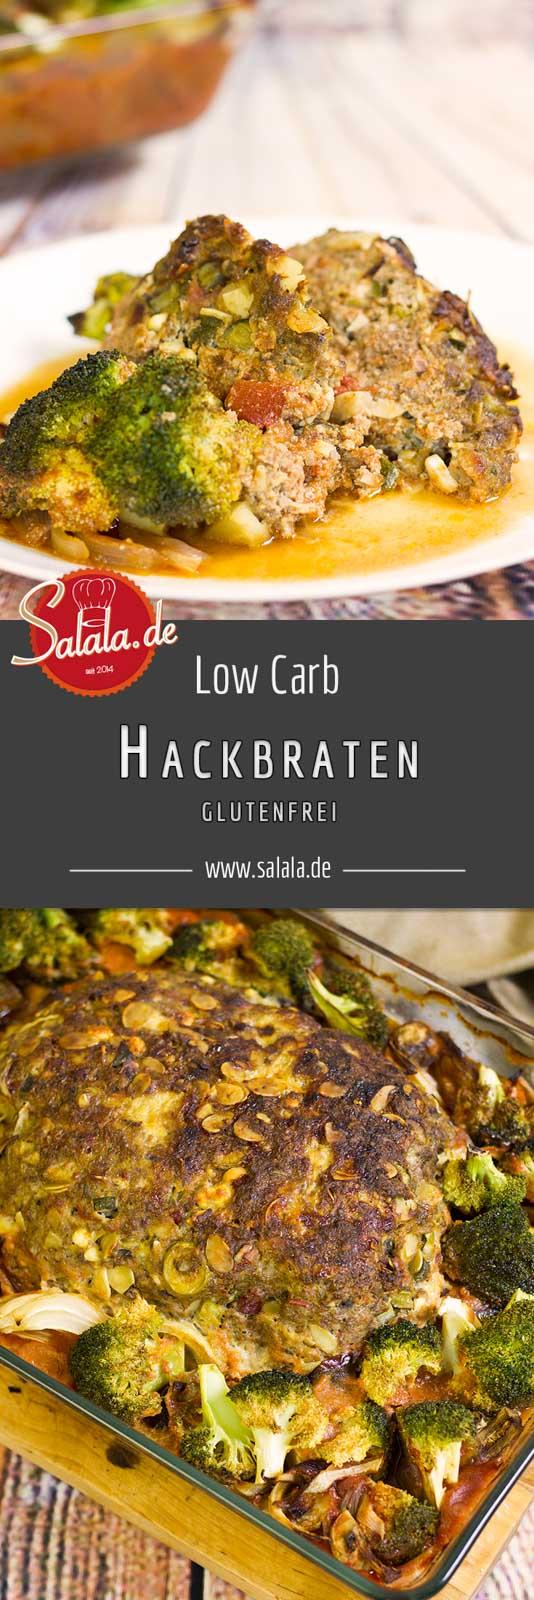 Hackbraten Rezept ohne Kohlenhydrate Low Carb und glutenfrei - by salala.de - Hackbraten ohne Brot mit Oliven Feta Tomaten selber machen